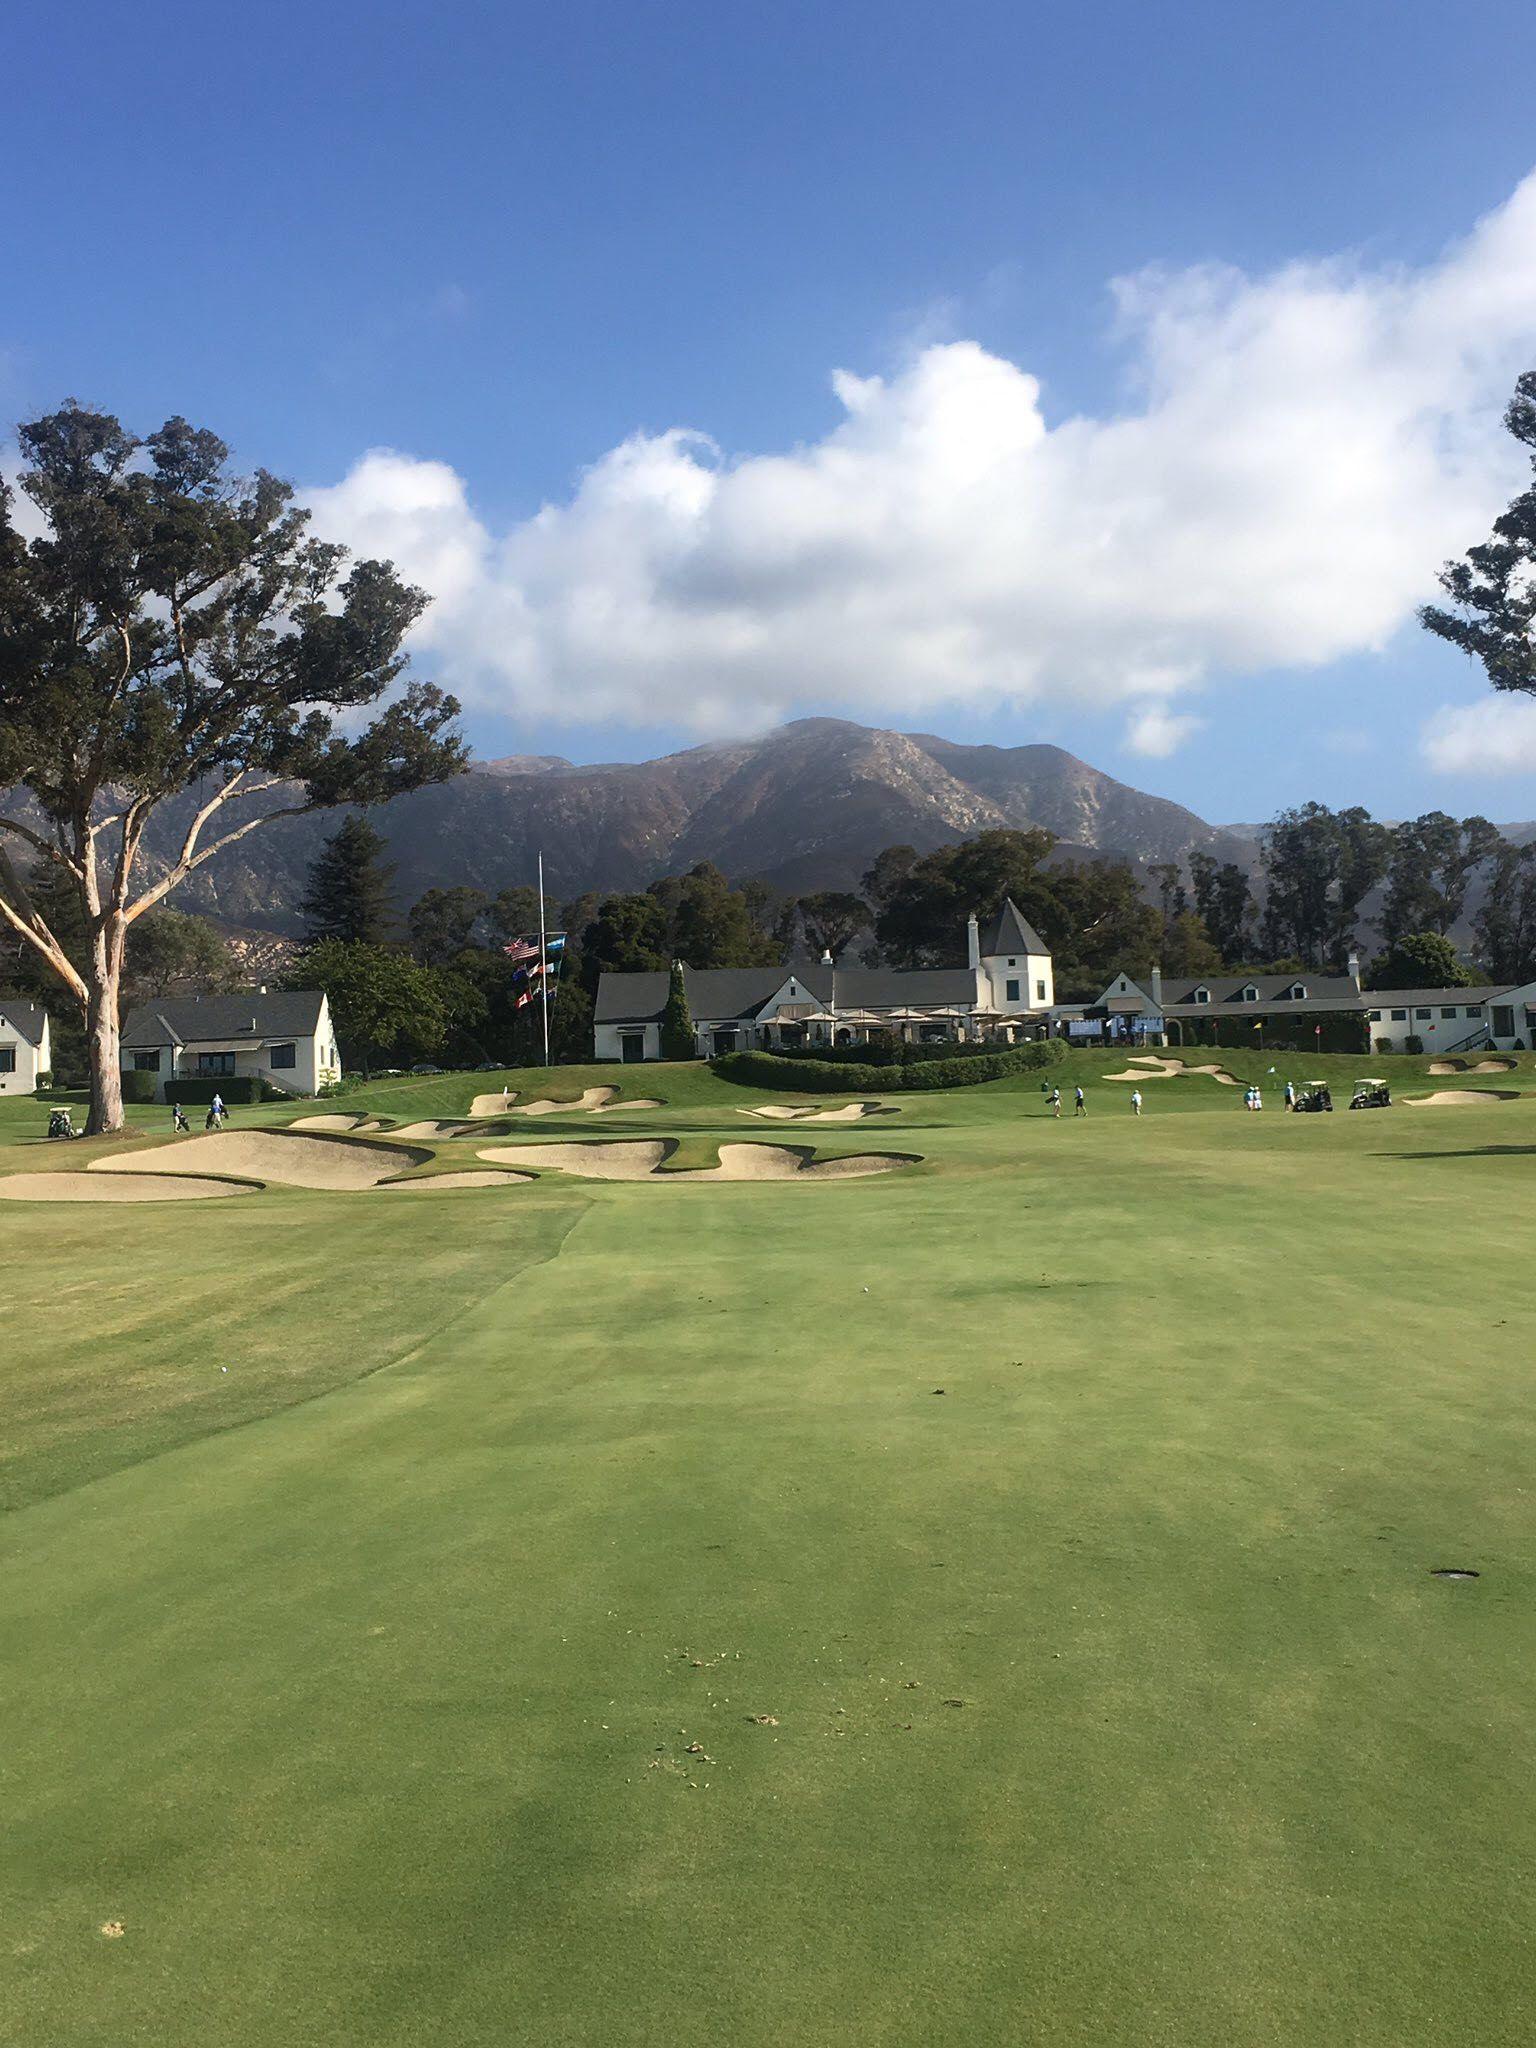 The Valley Club Santa Barbara Vacation Rentals Luxury Vacation Luxury Vacation Rentals